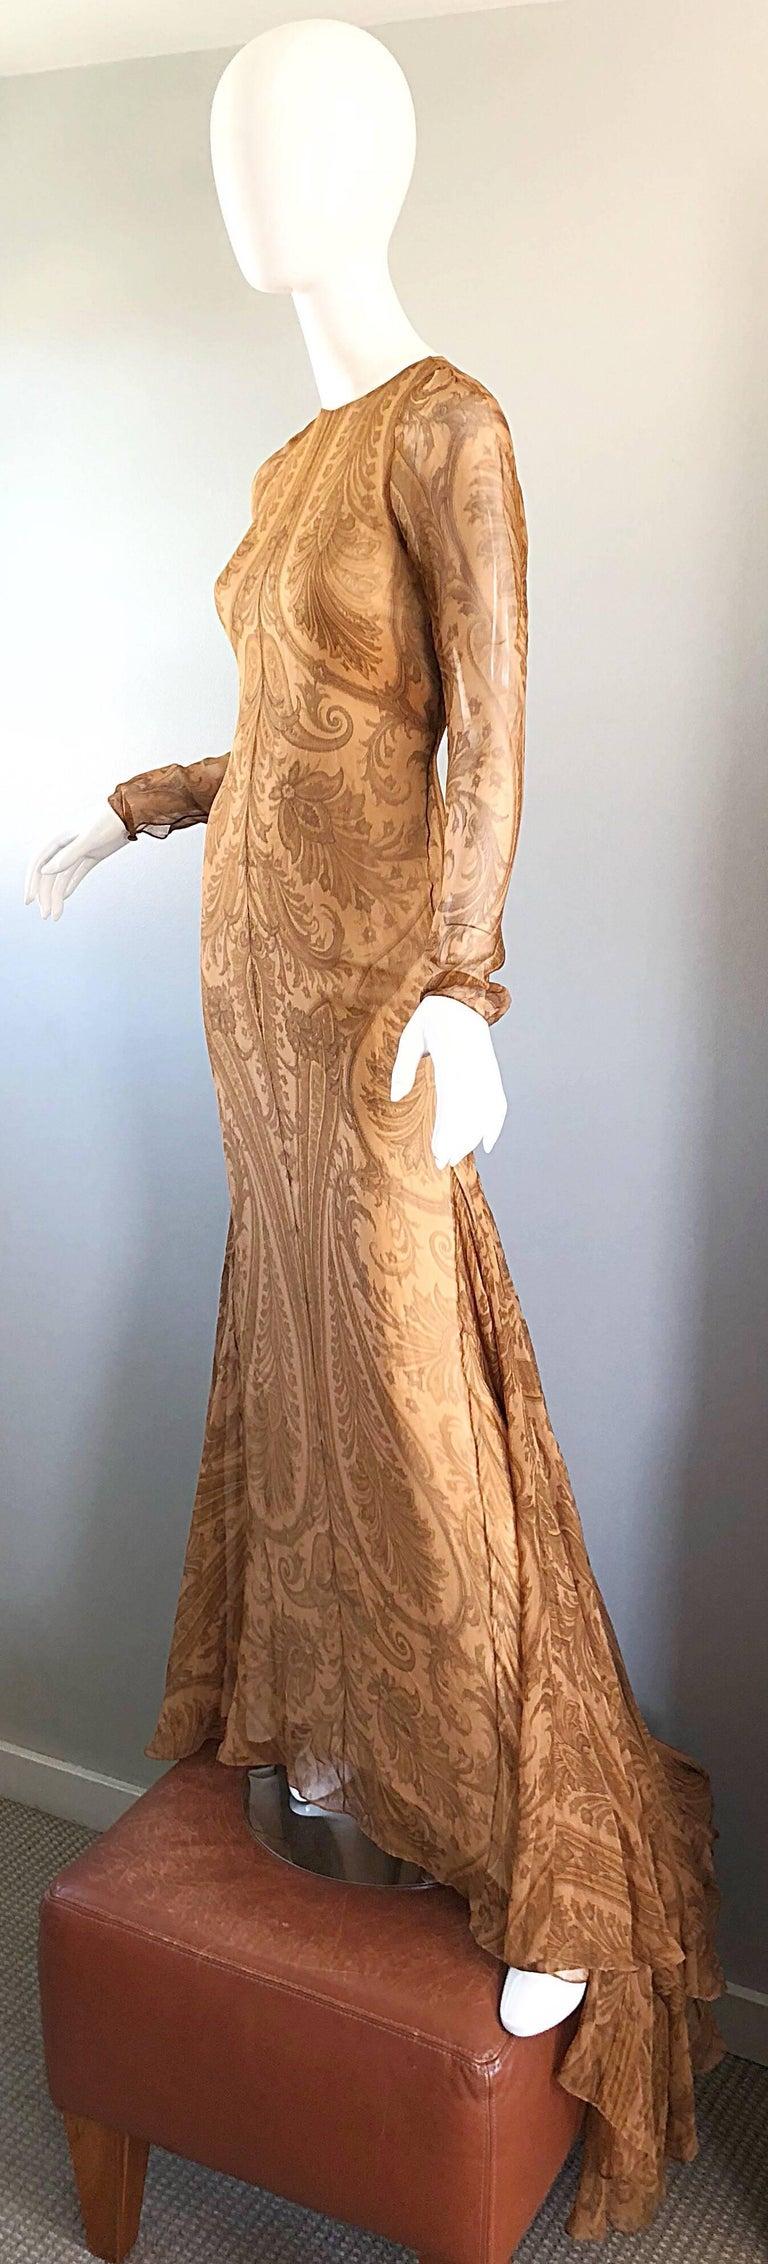 Women's Sensational 1990s Bill Blass Couture Nude Silk Chiffon Paisley Vintage 90s Gown  For Sale